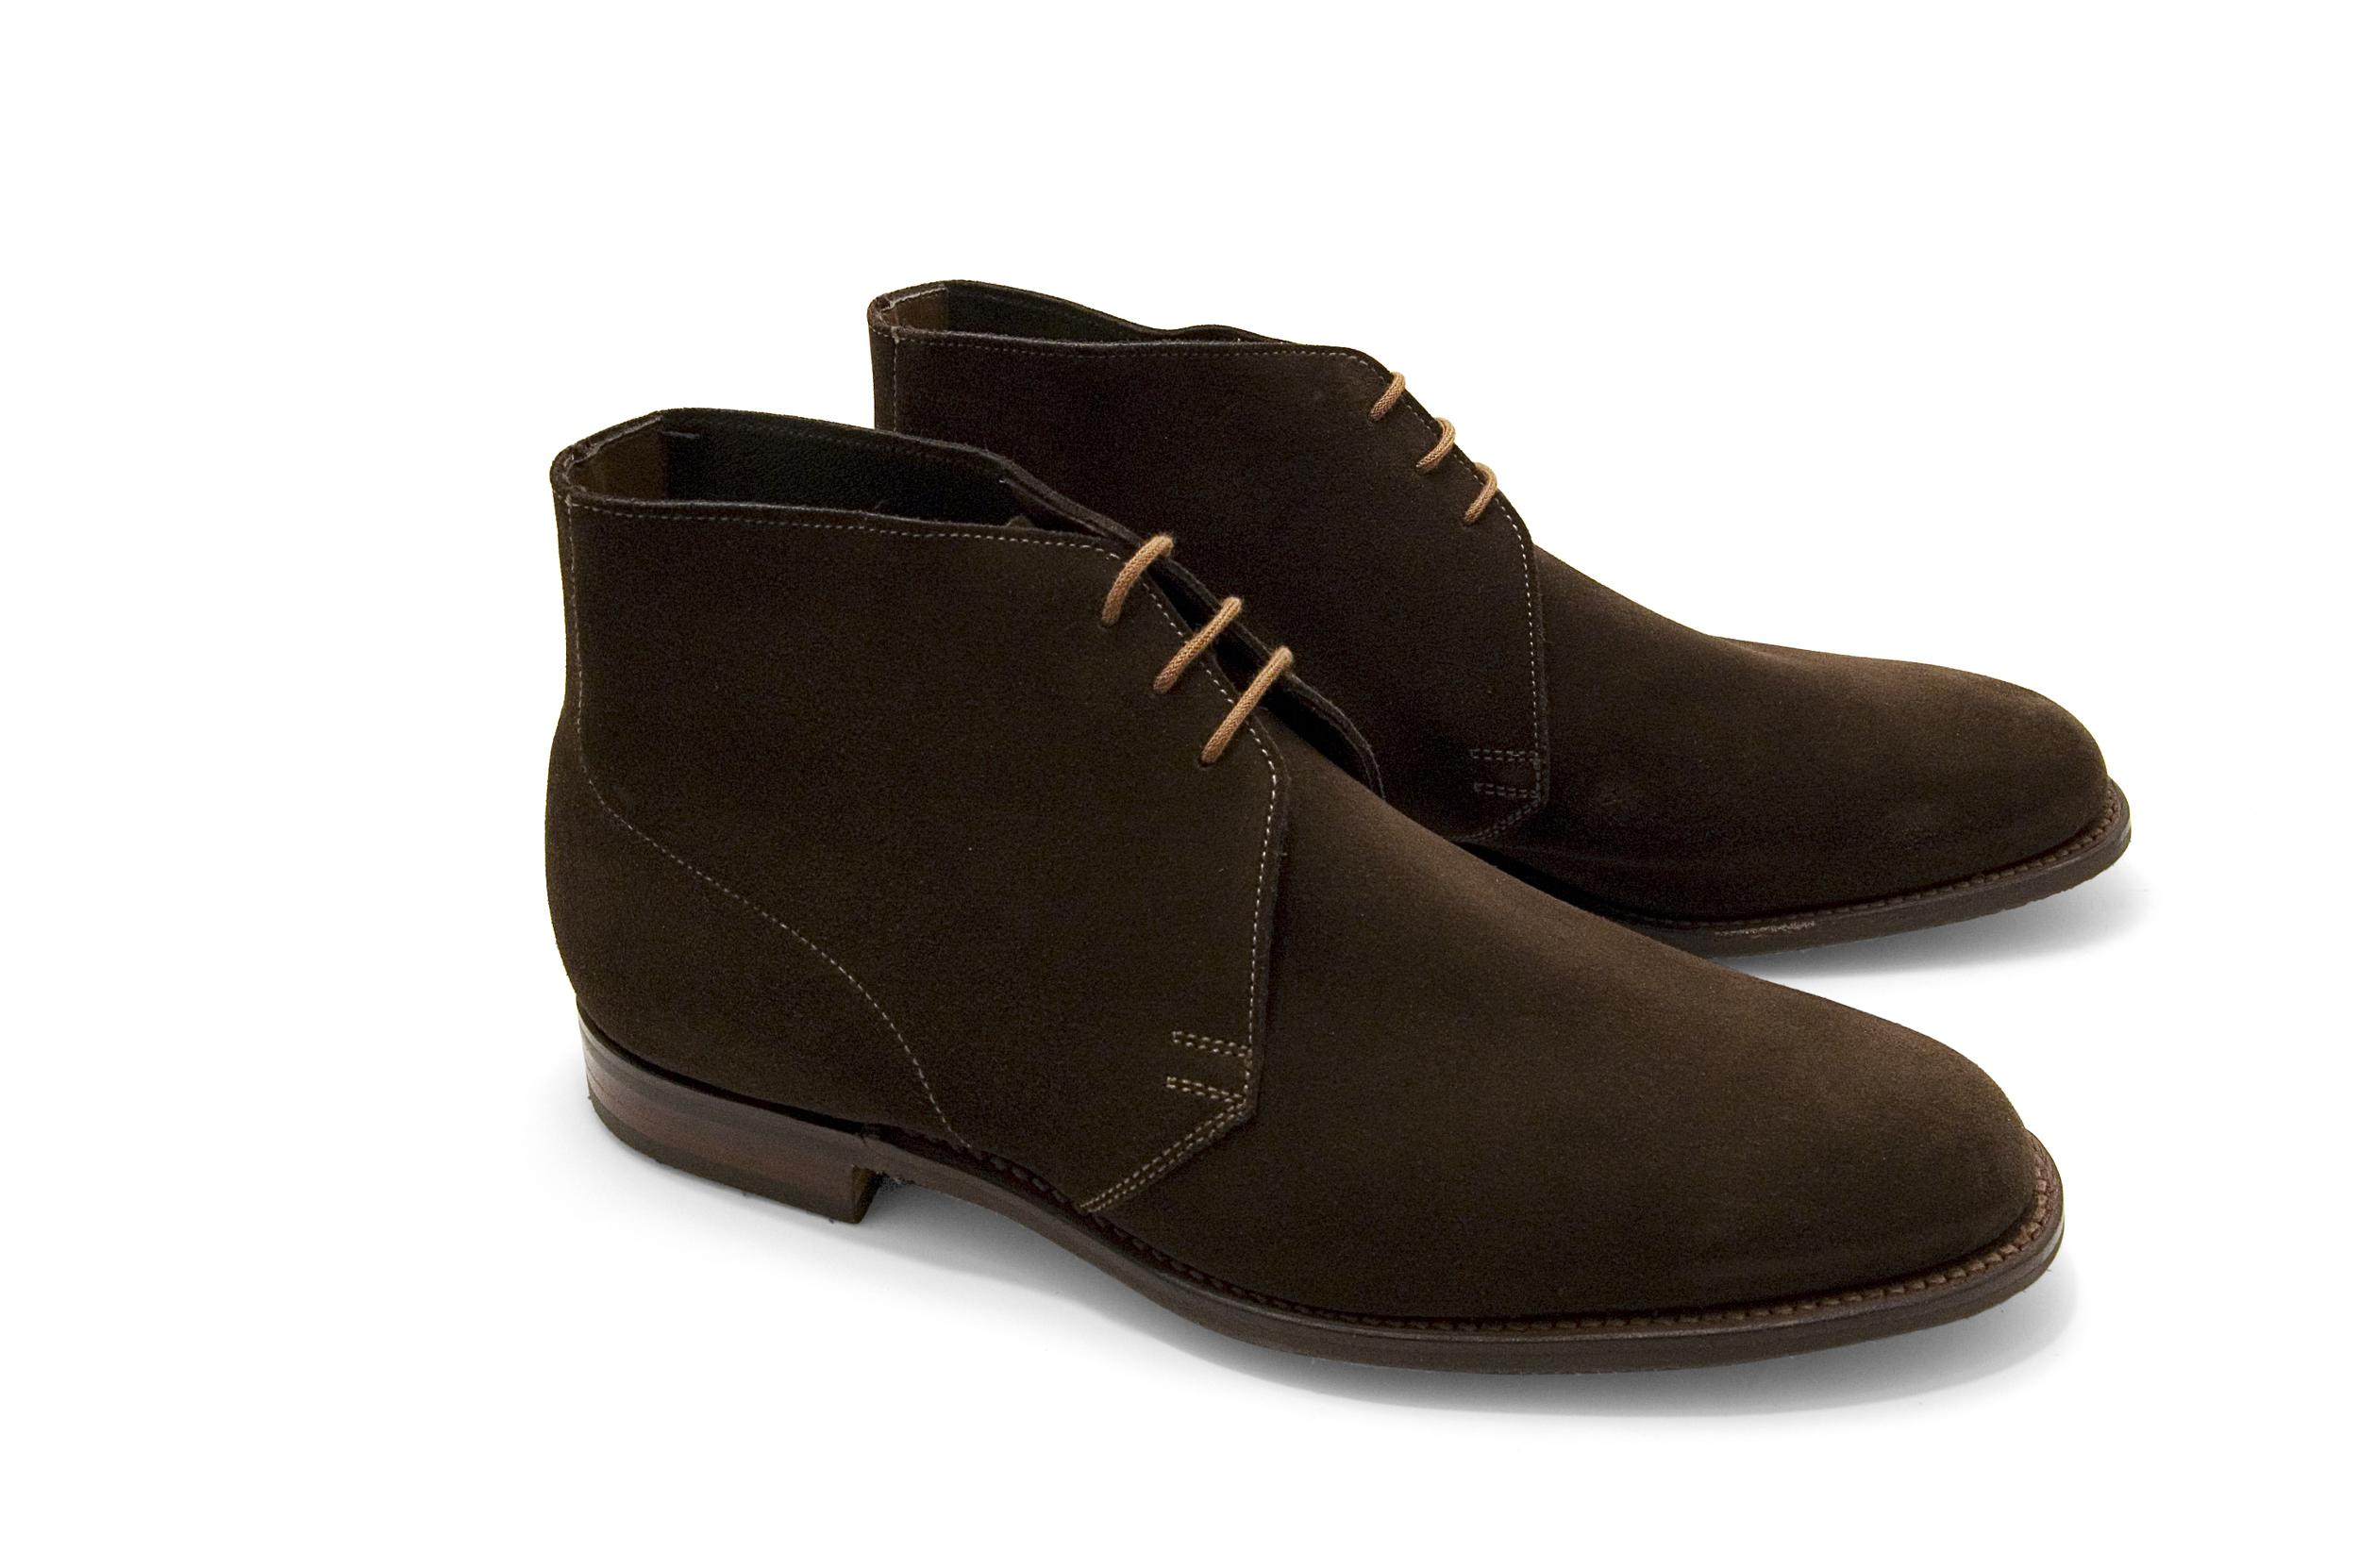 Crockett \u0026 Jones Chukka Boot – Dark